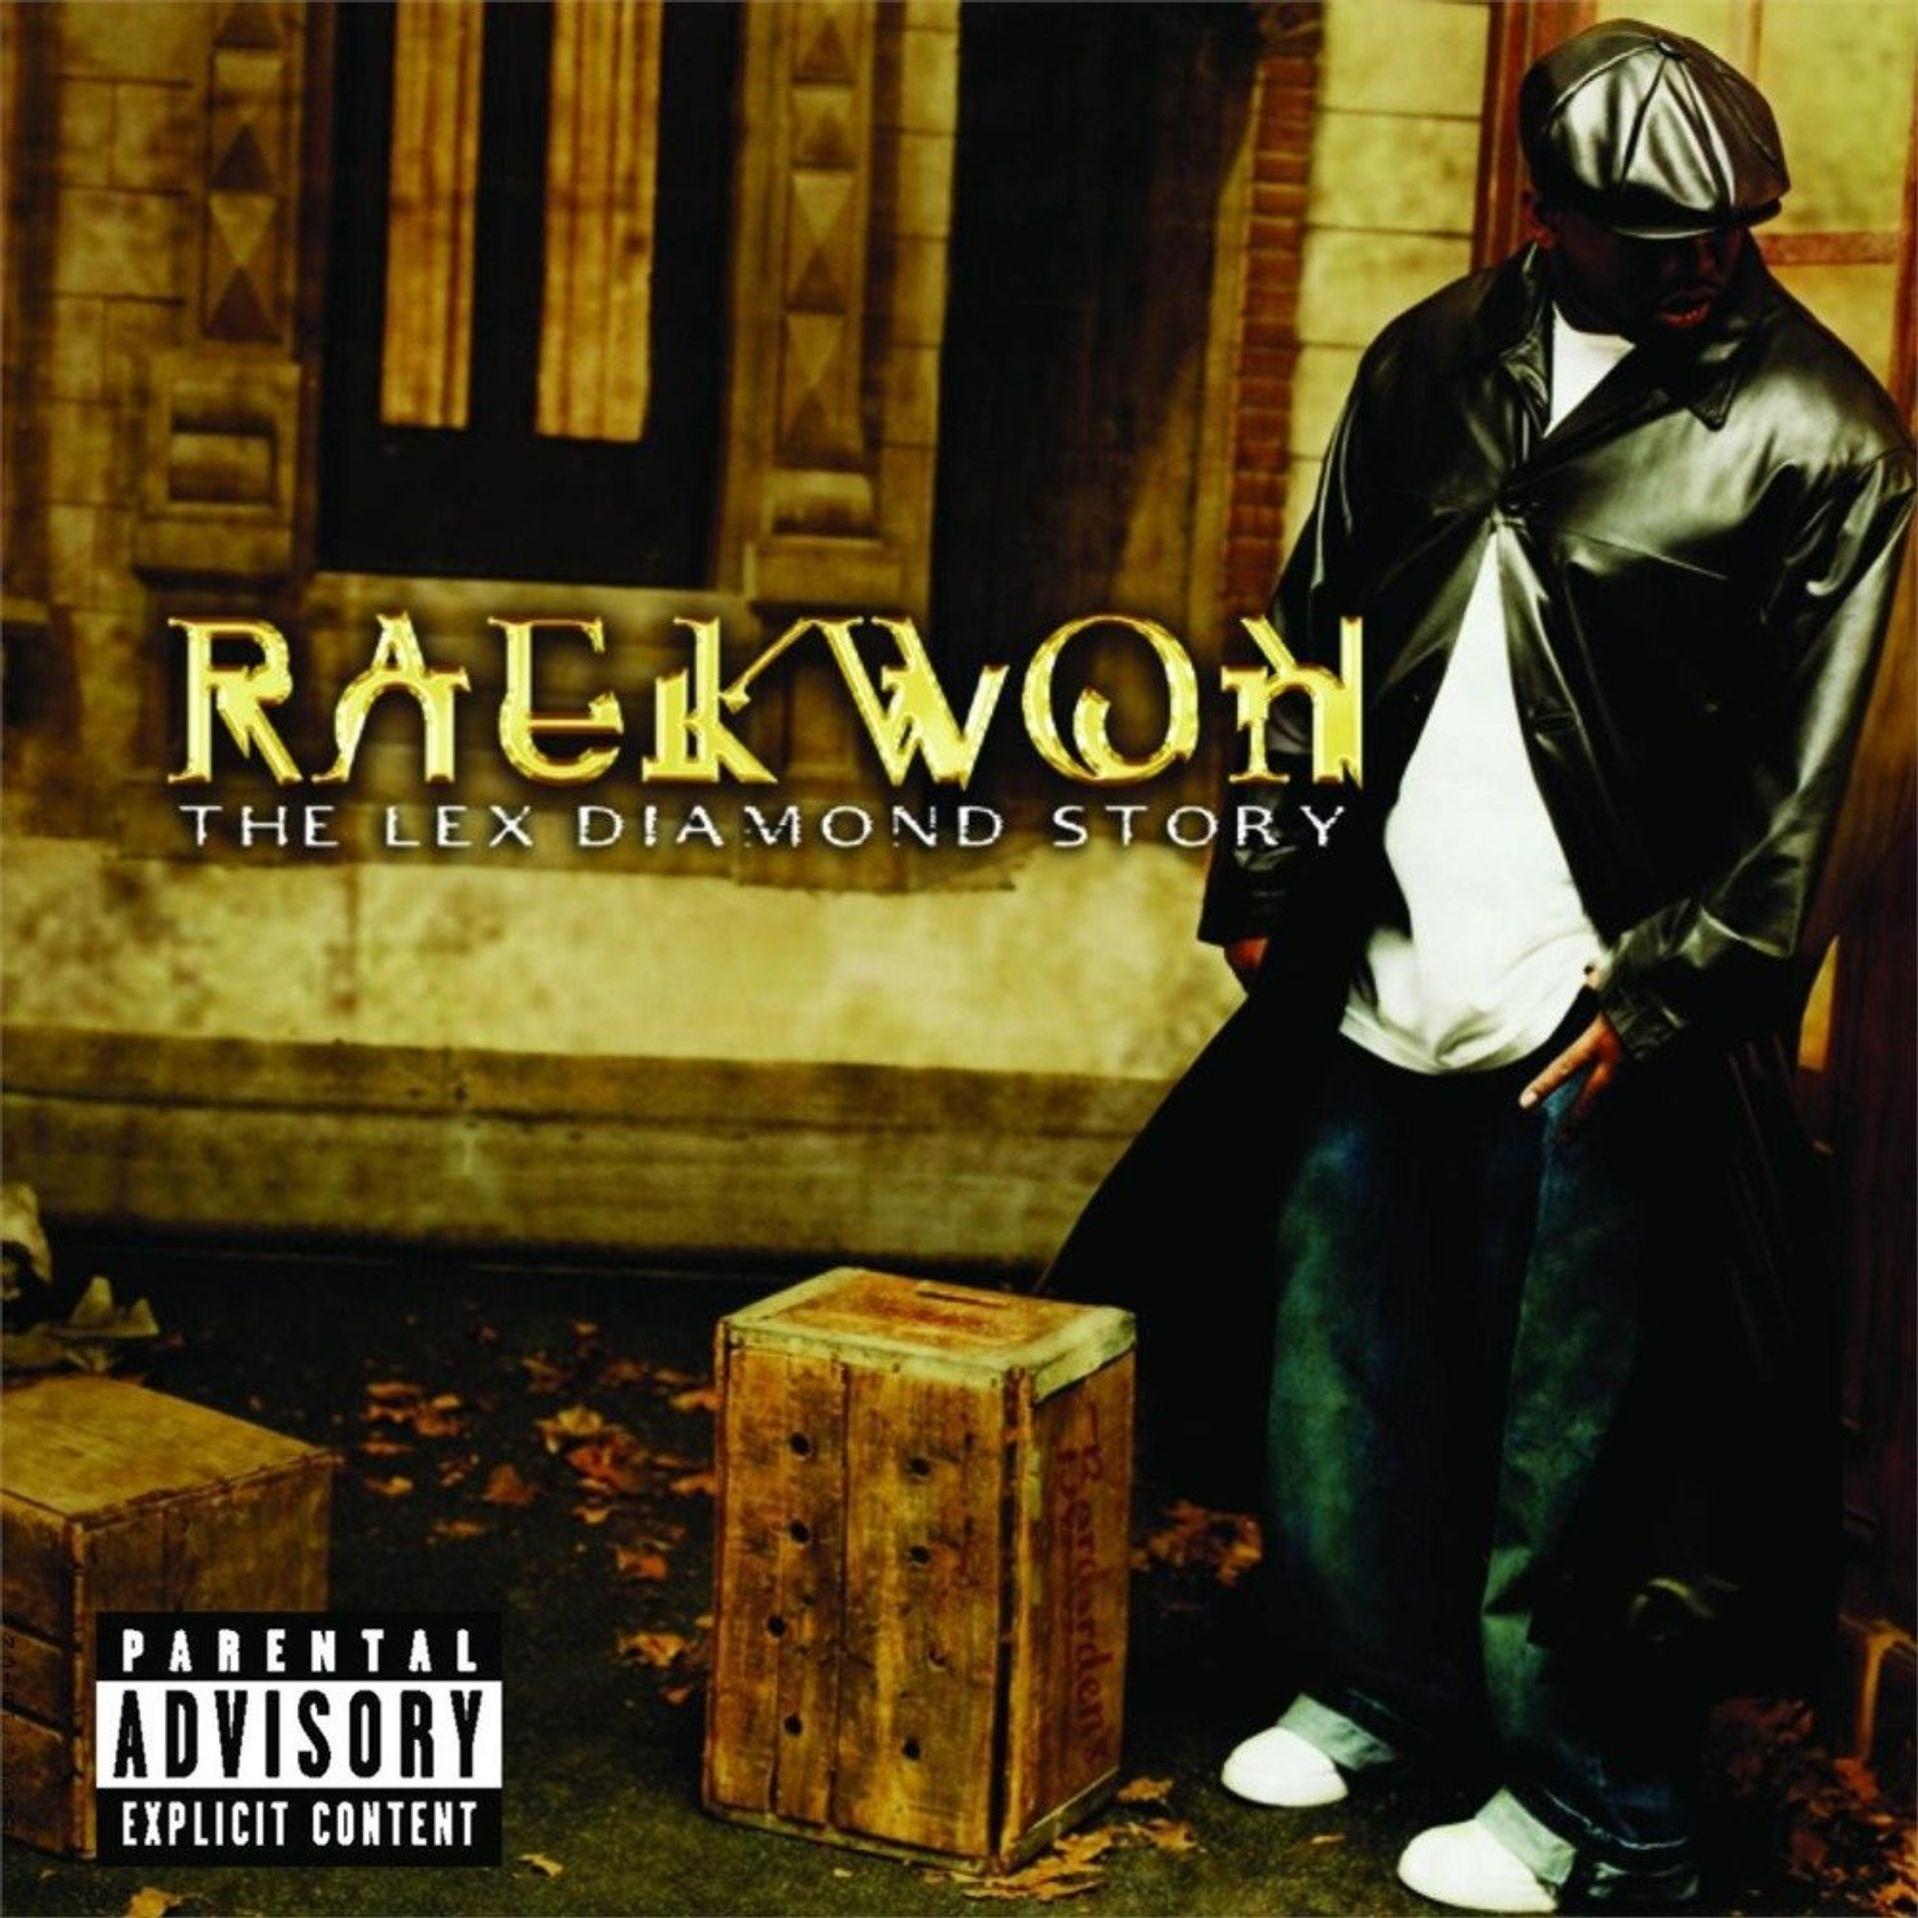 Album Title: The Lex Diamond Story by: Raekwon